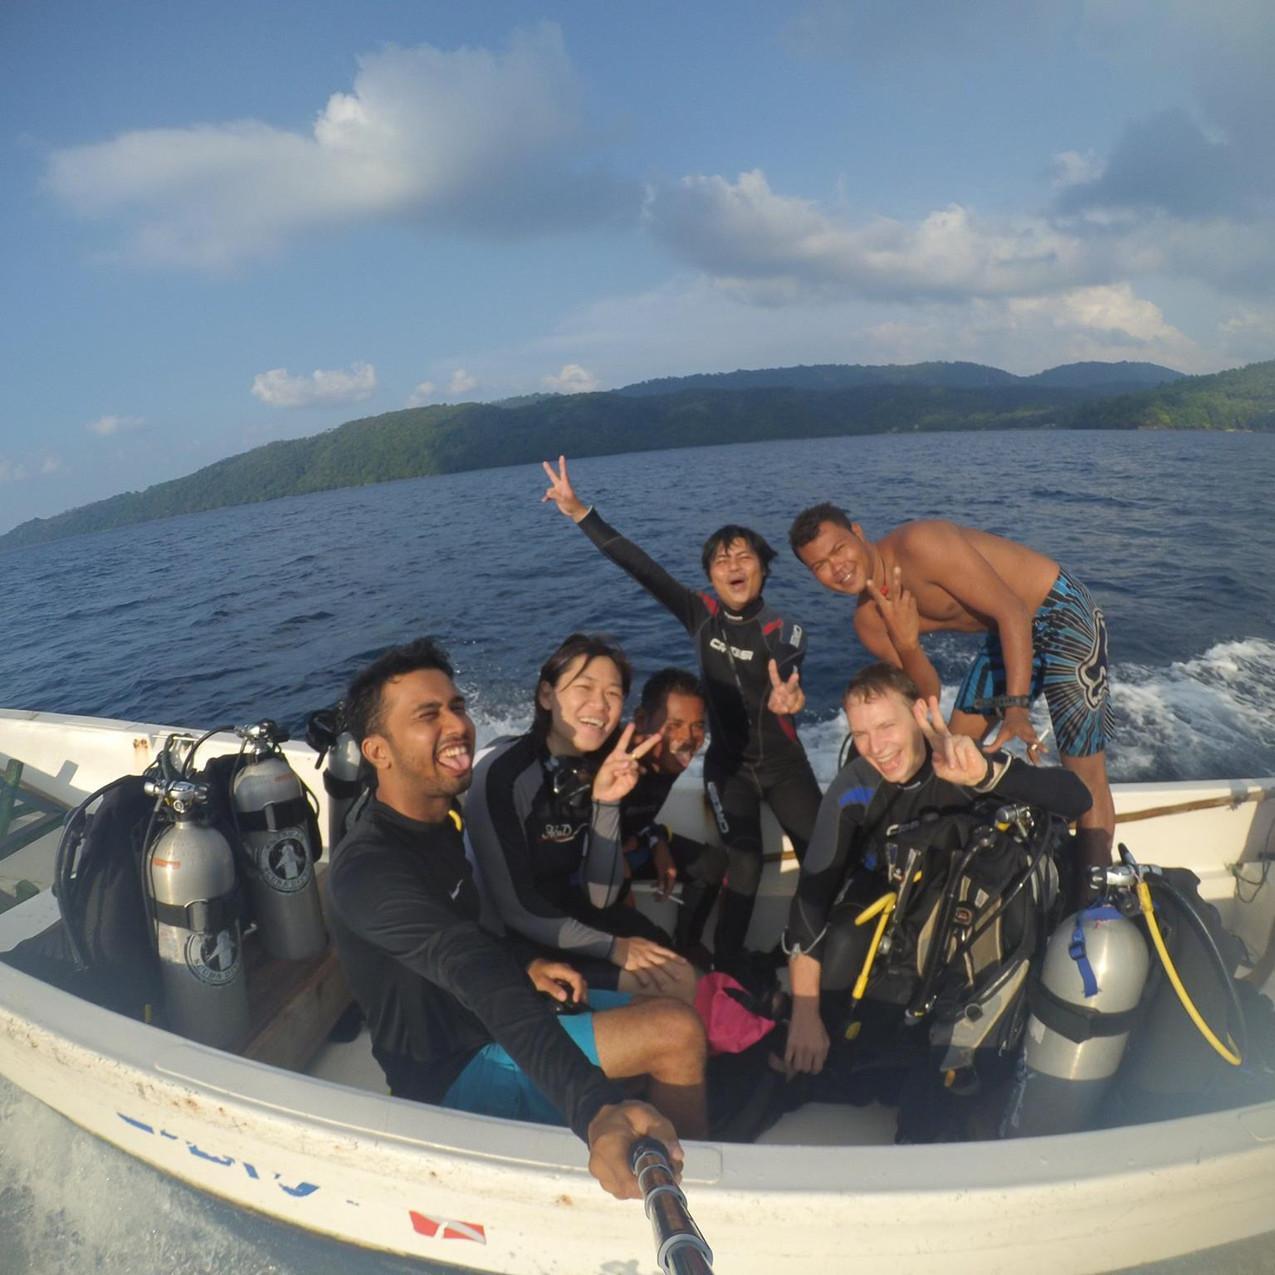 Patrick Gilfether scuba diving